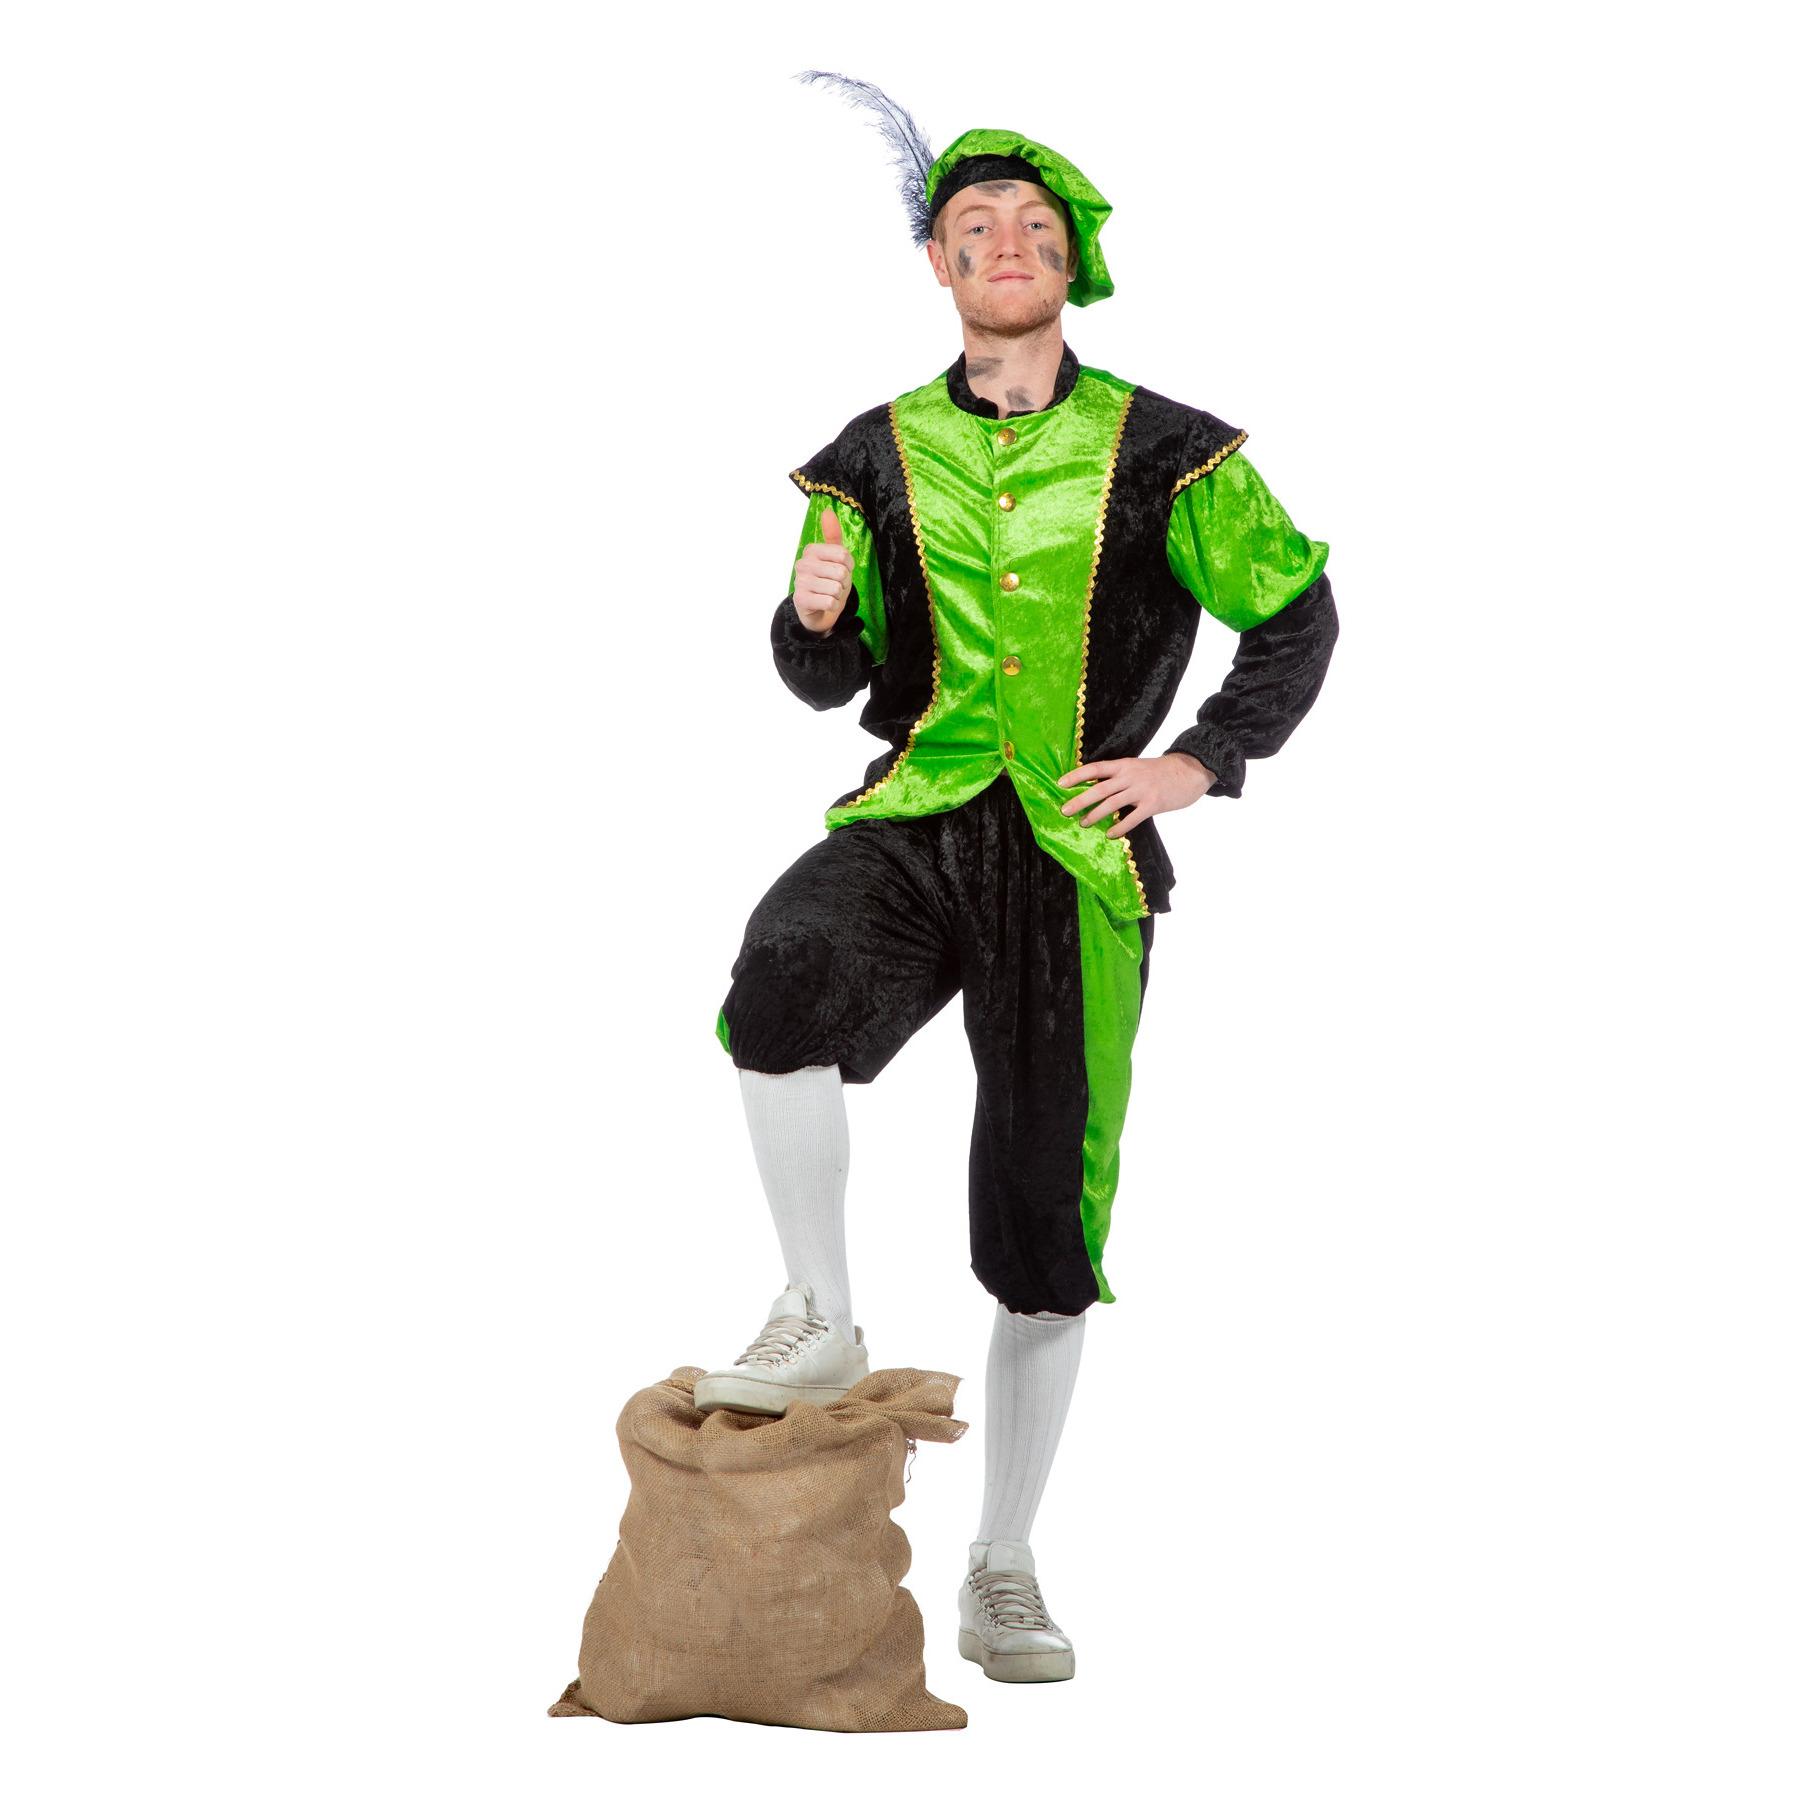 Merkloos Verkleedkleding Groene pieten kostuum budget